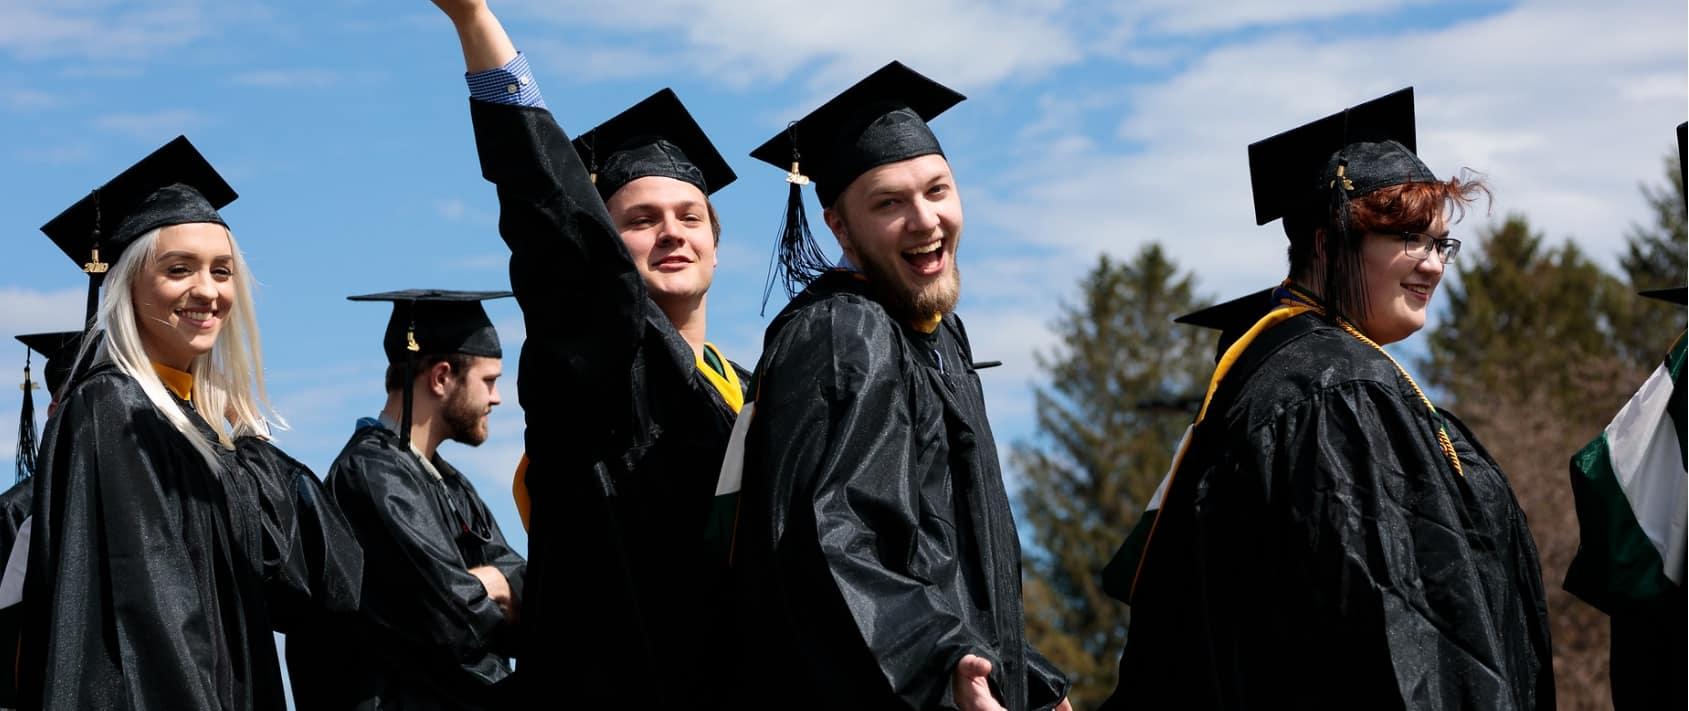 commencement, graduation, smiling, students talking